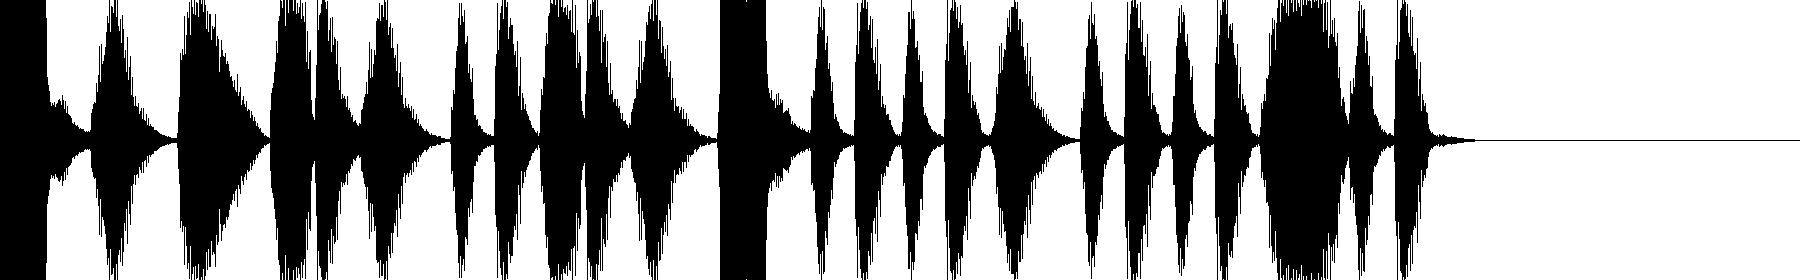 cymatics   terror bass loop e 150bpm   002